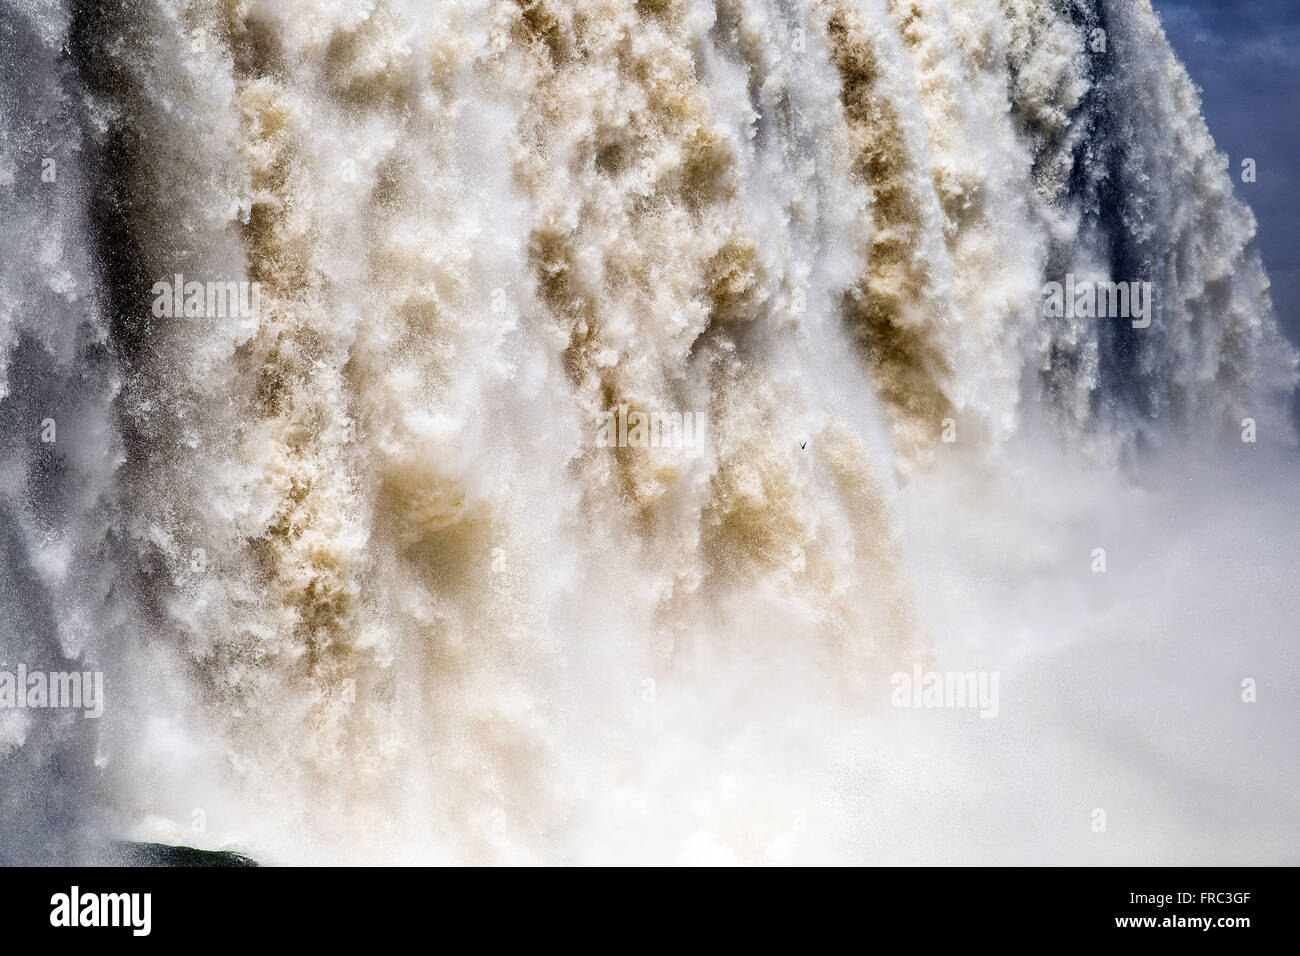 Detail of the Iguaçu Falls - Stock Image